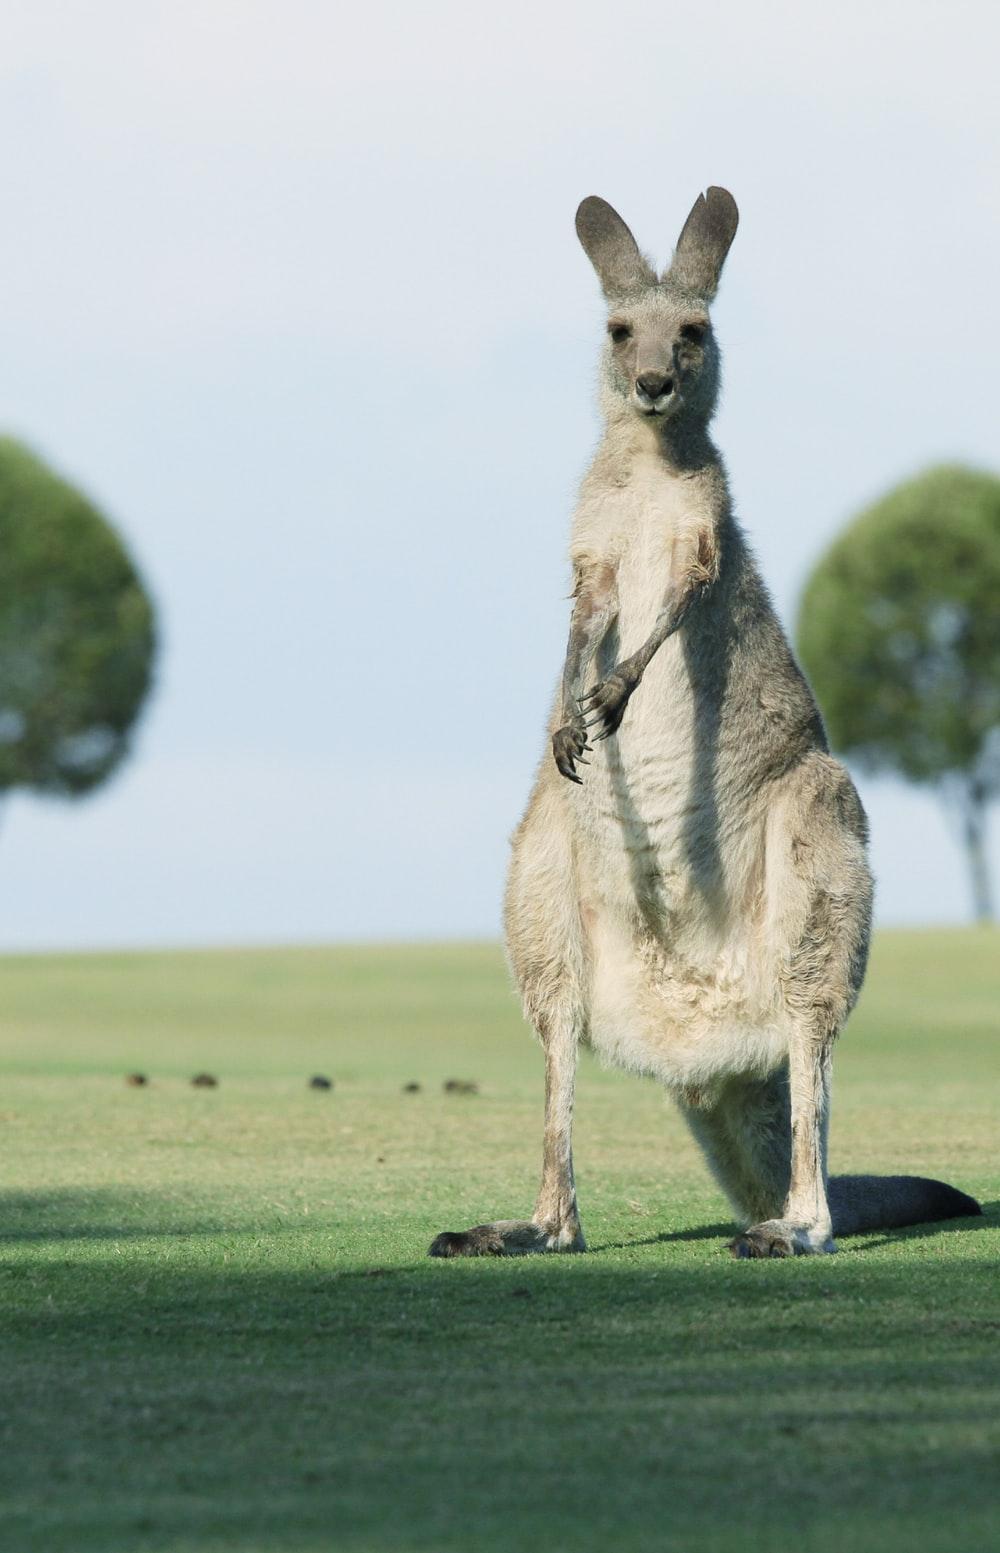 Kangaroo standing in green grass field